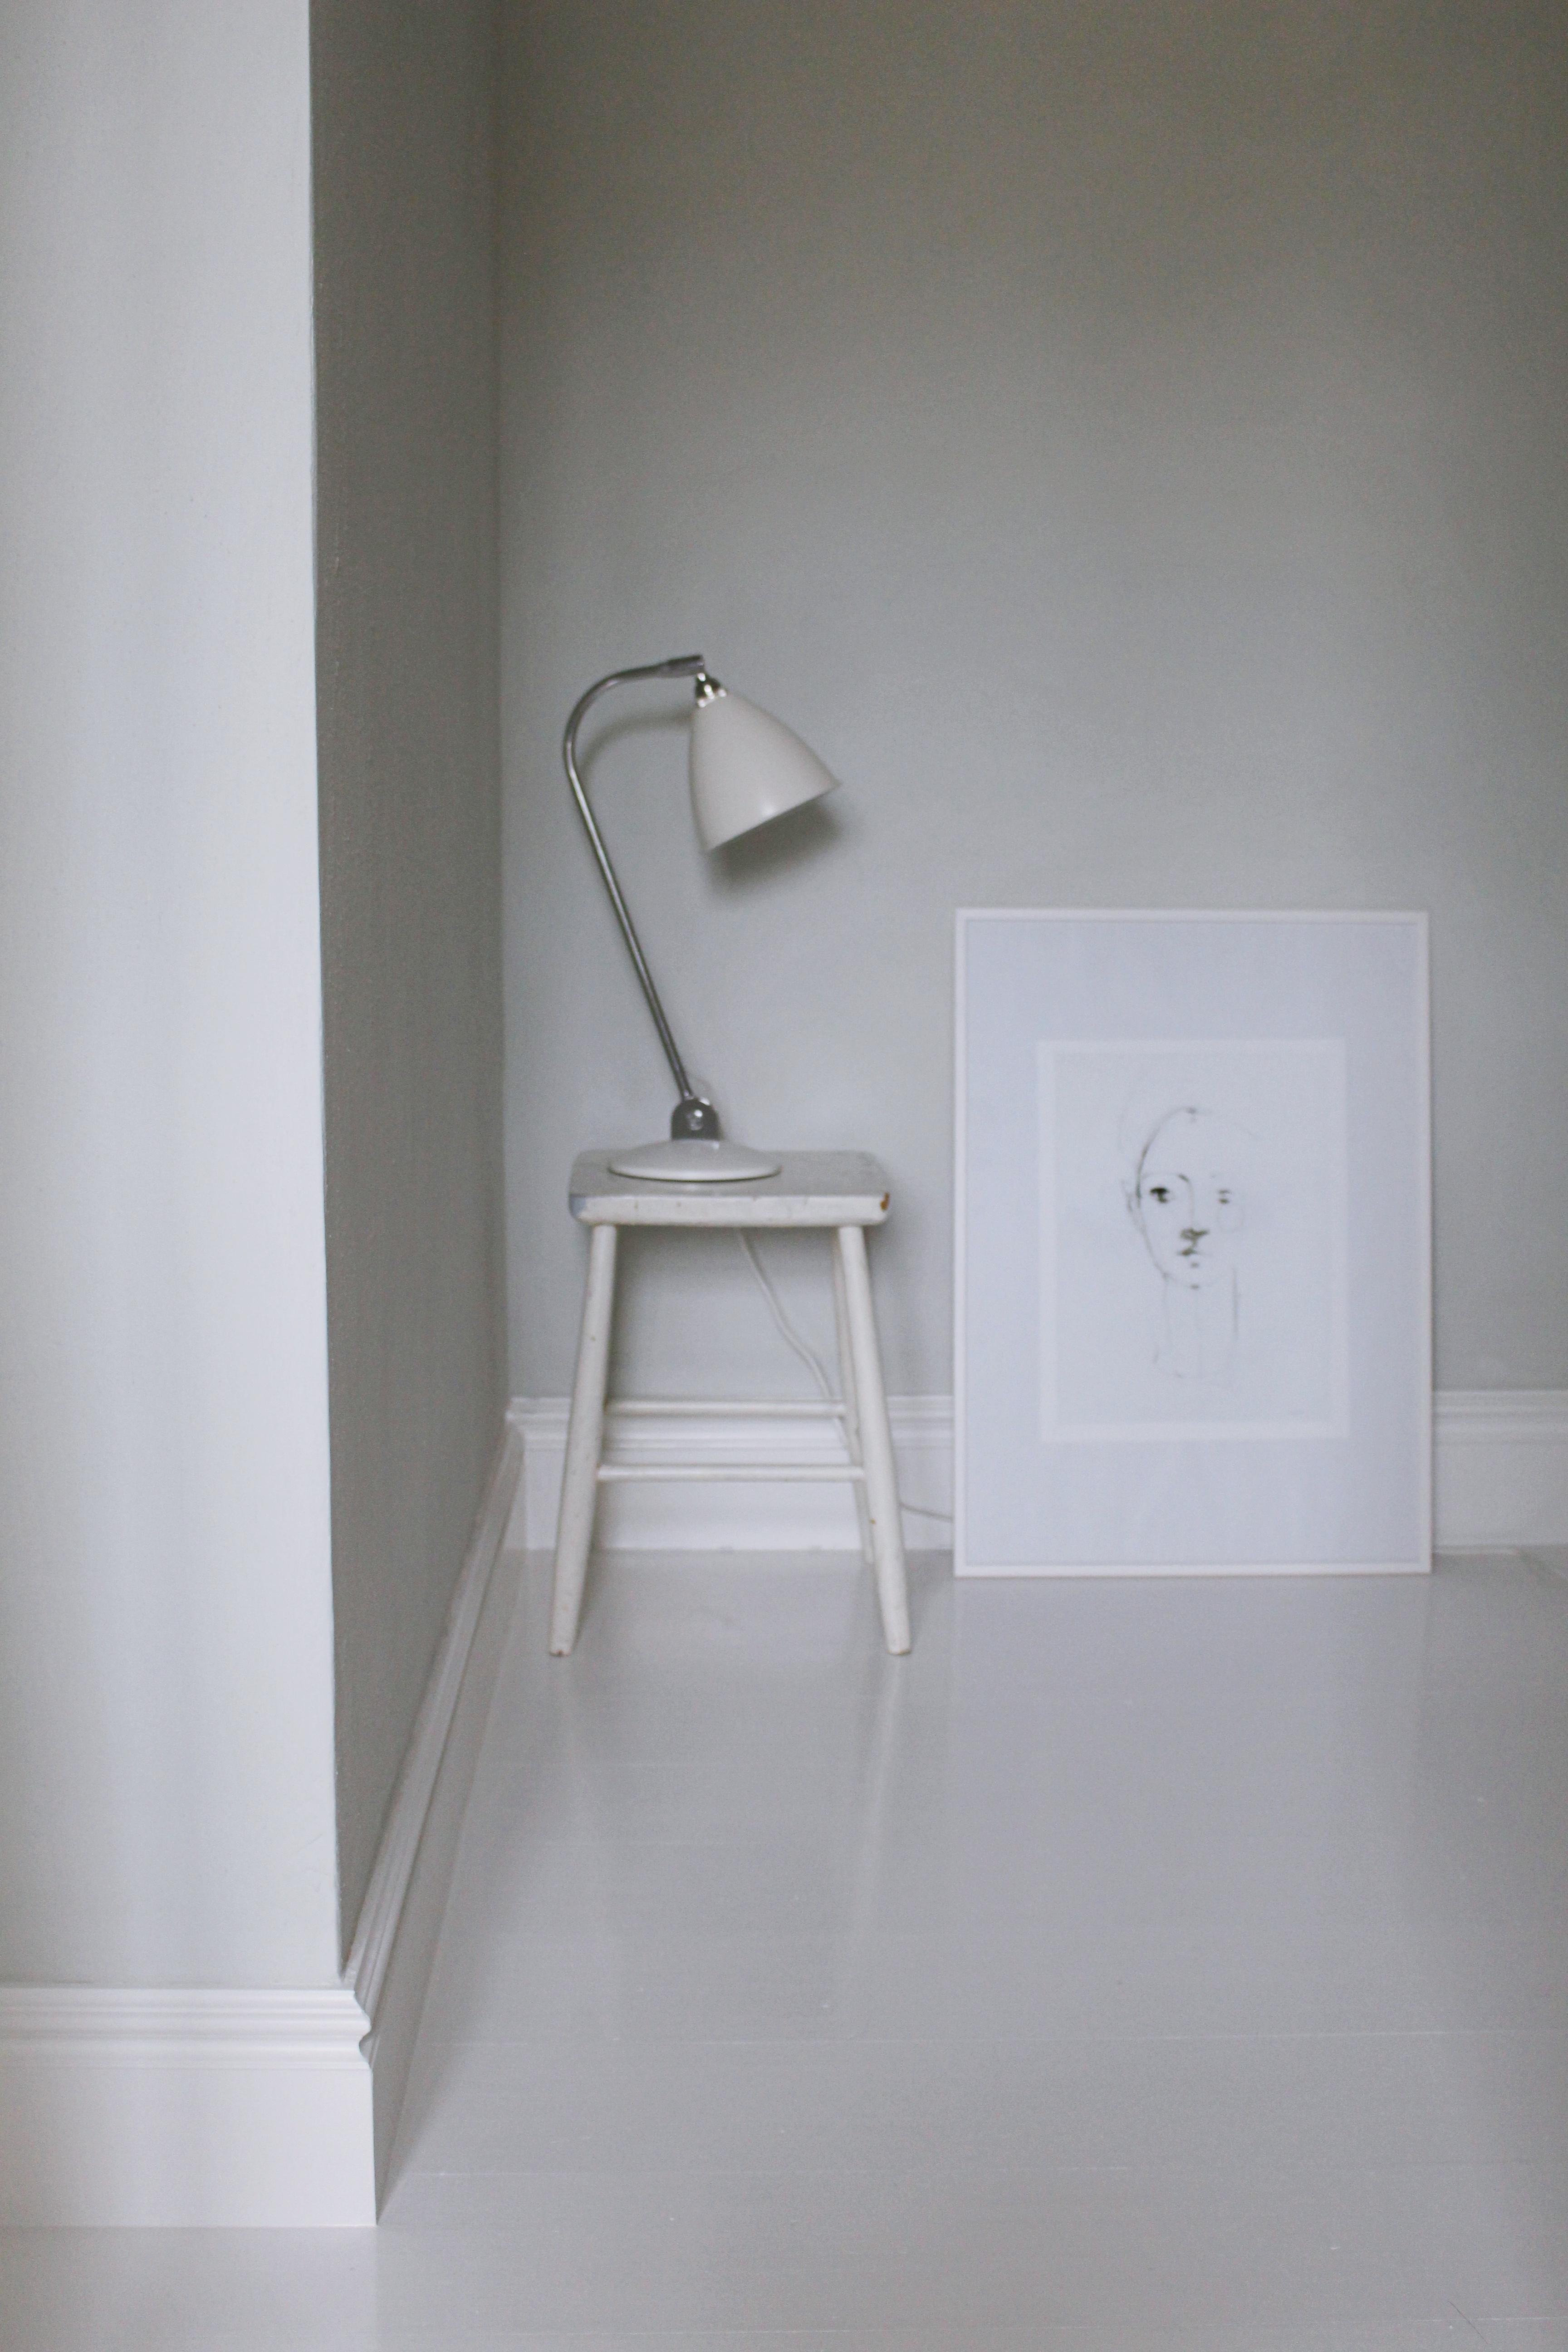 Butik Julias vita drömmar Sovrum Renovering - Julia K - Metro Mode